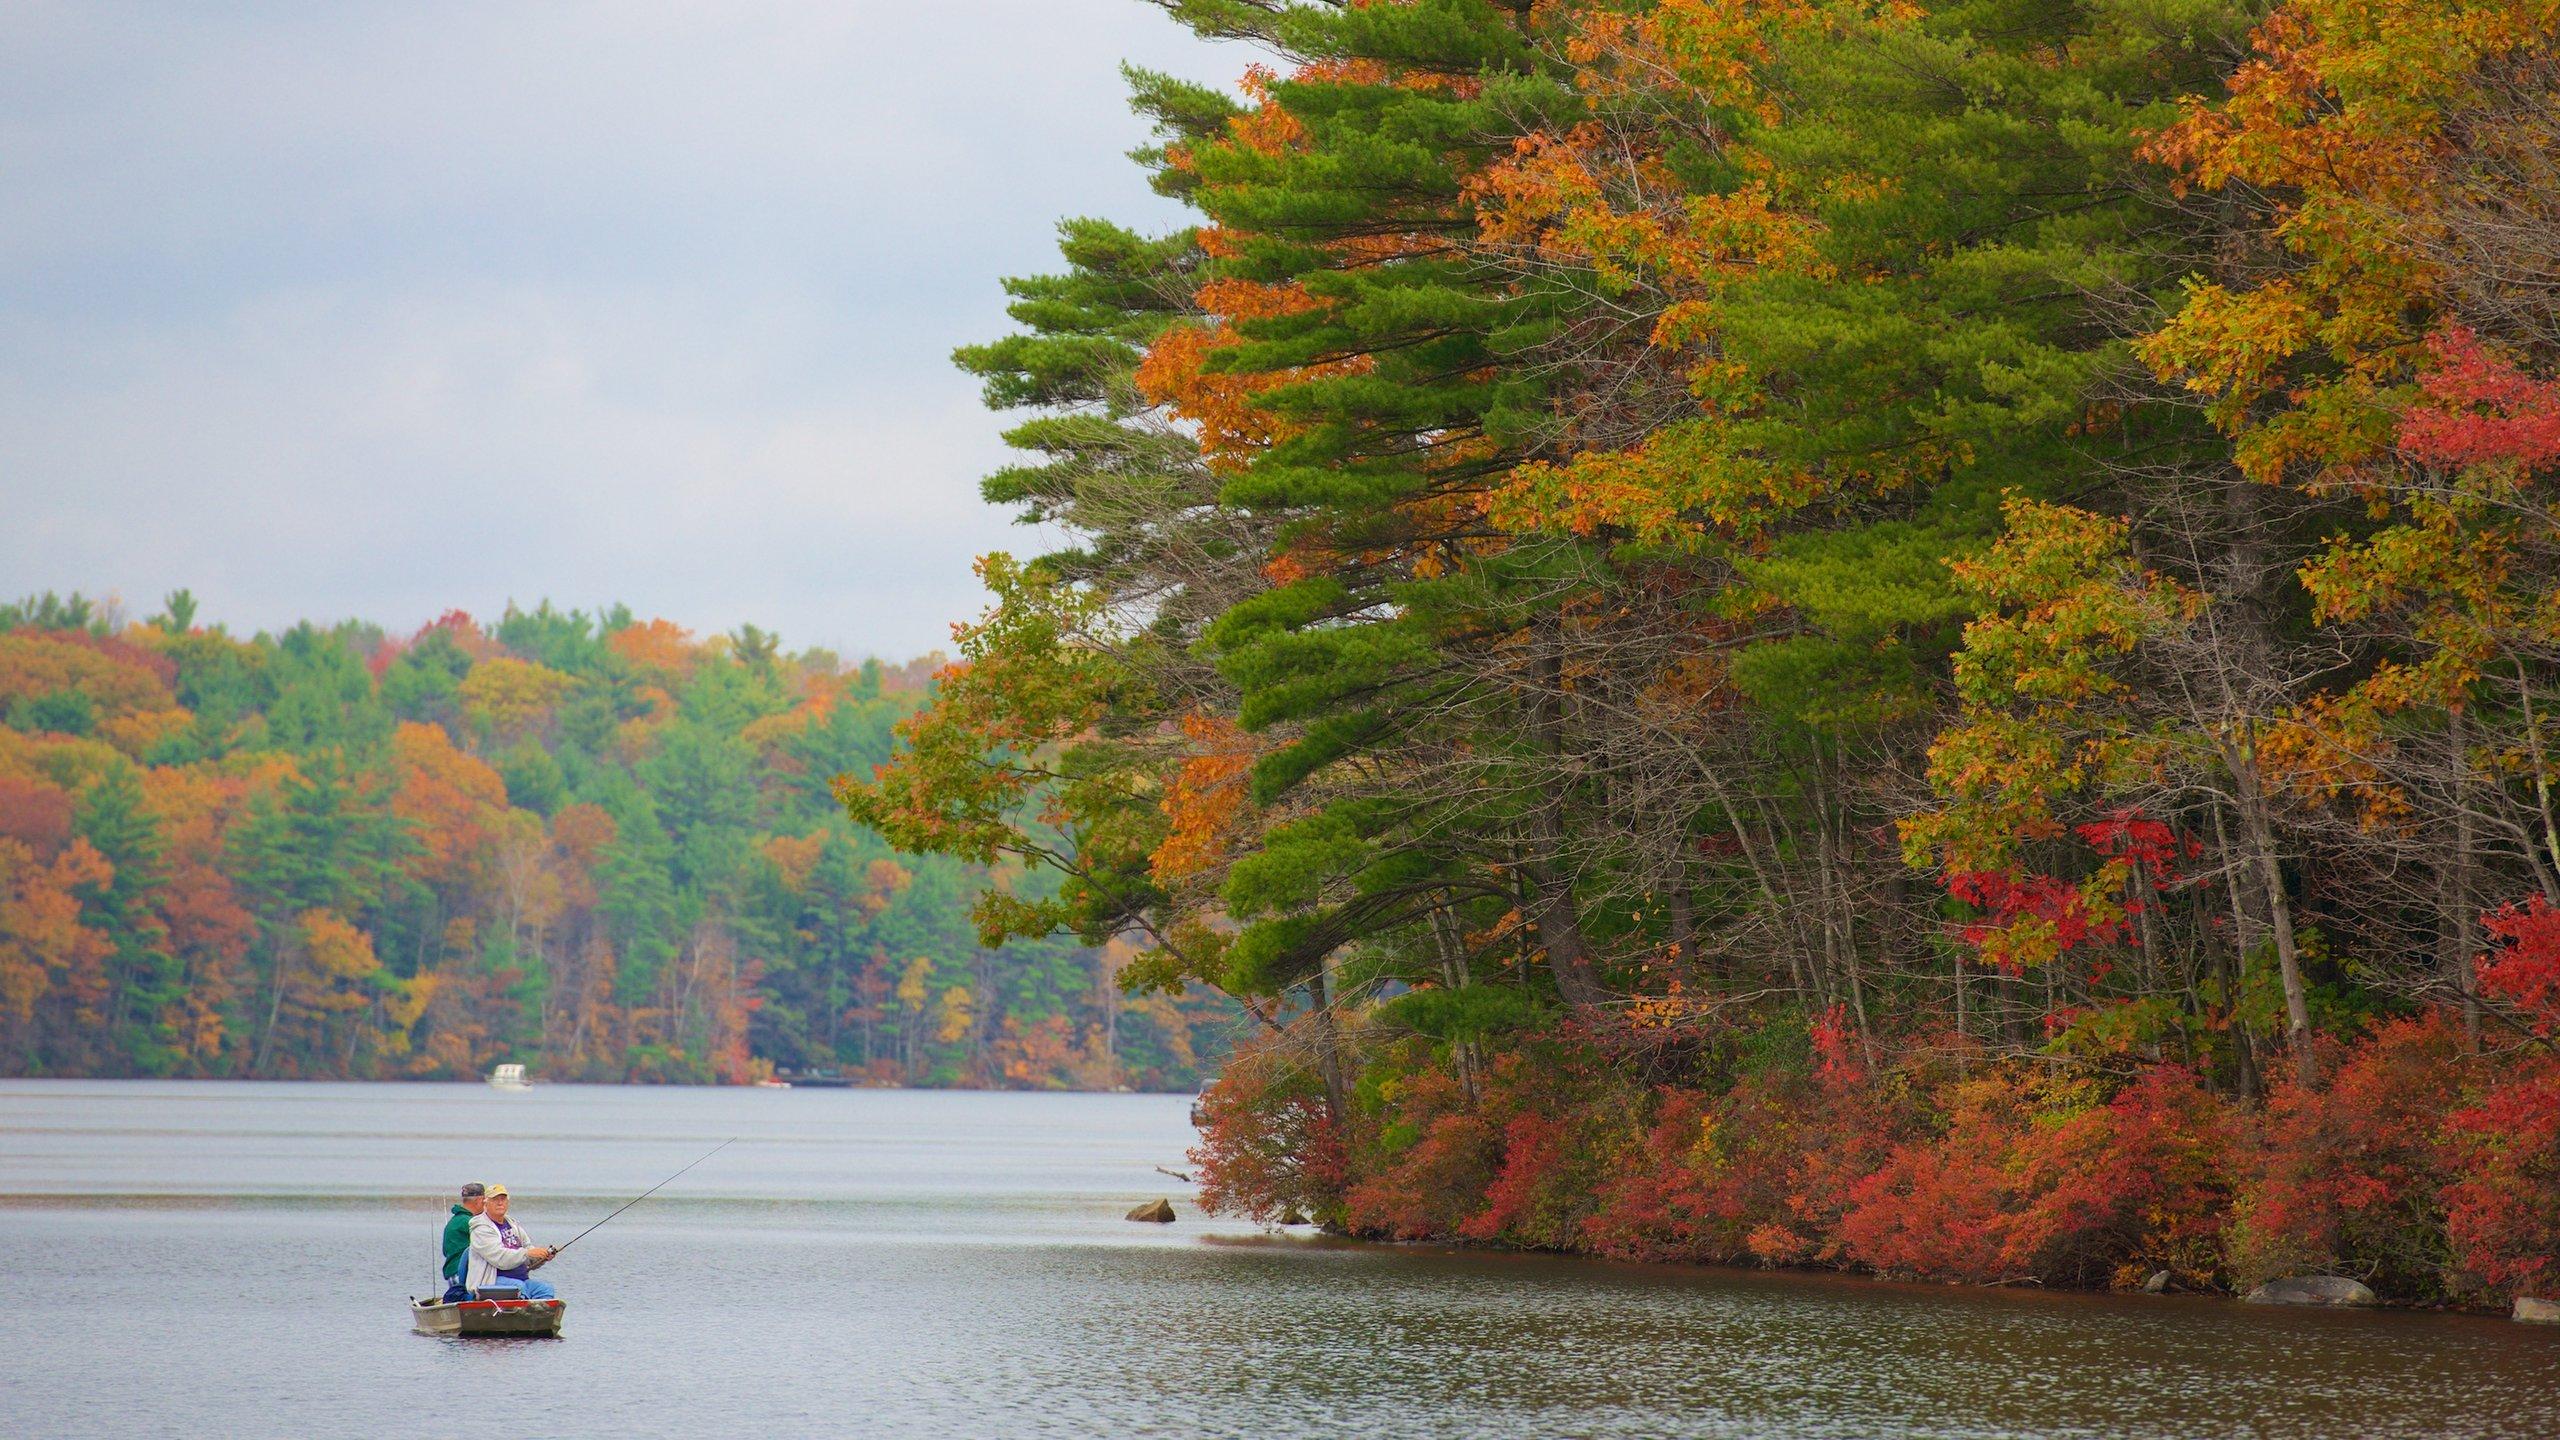 Buzzards Bay, Massachusetts, United States of America